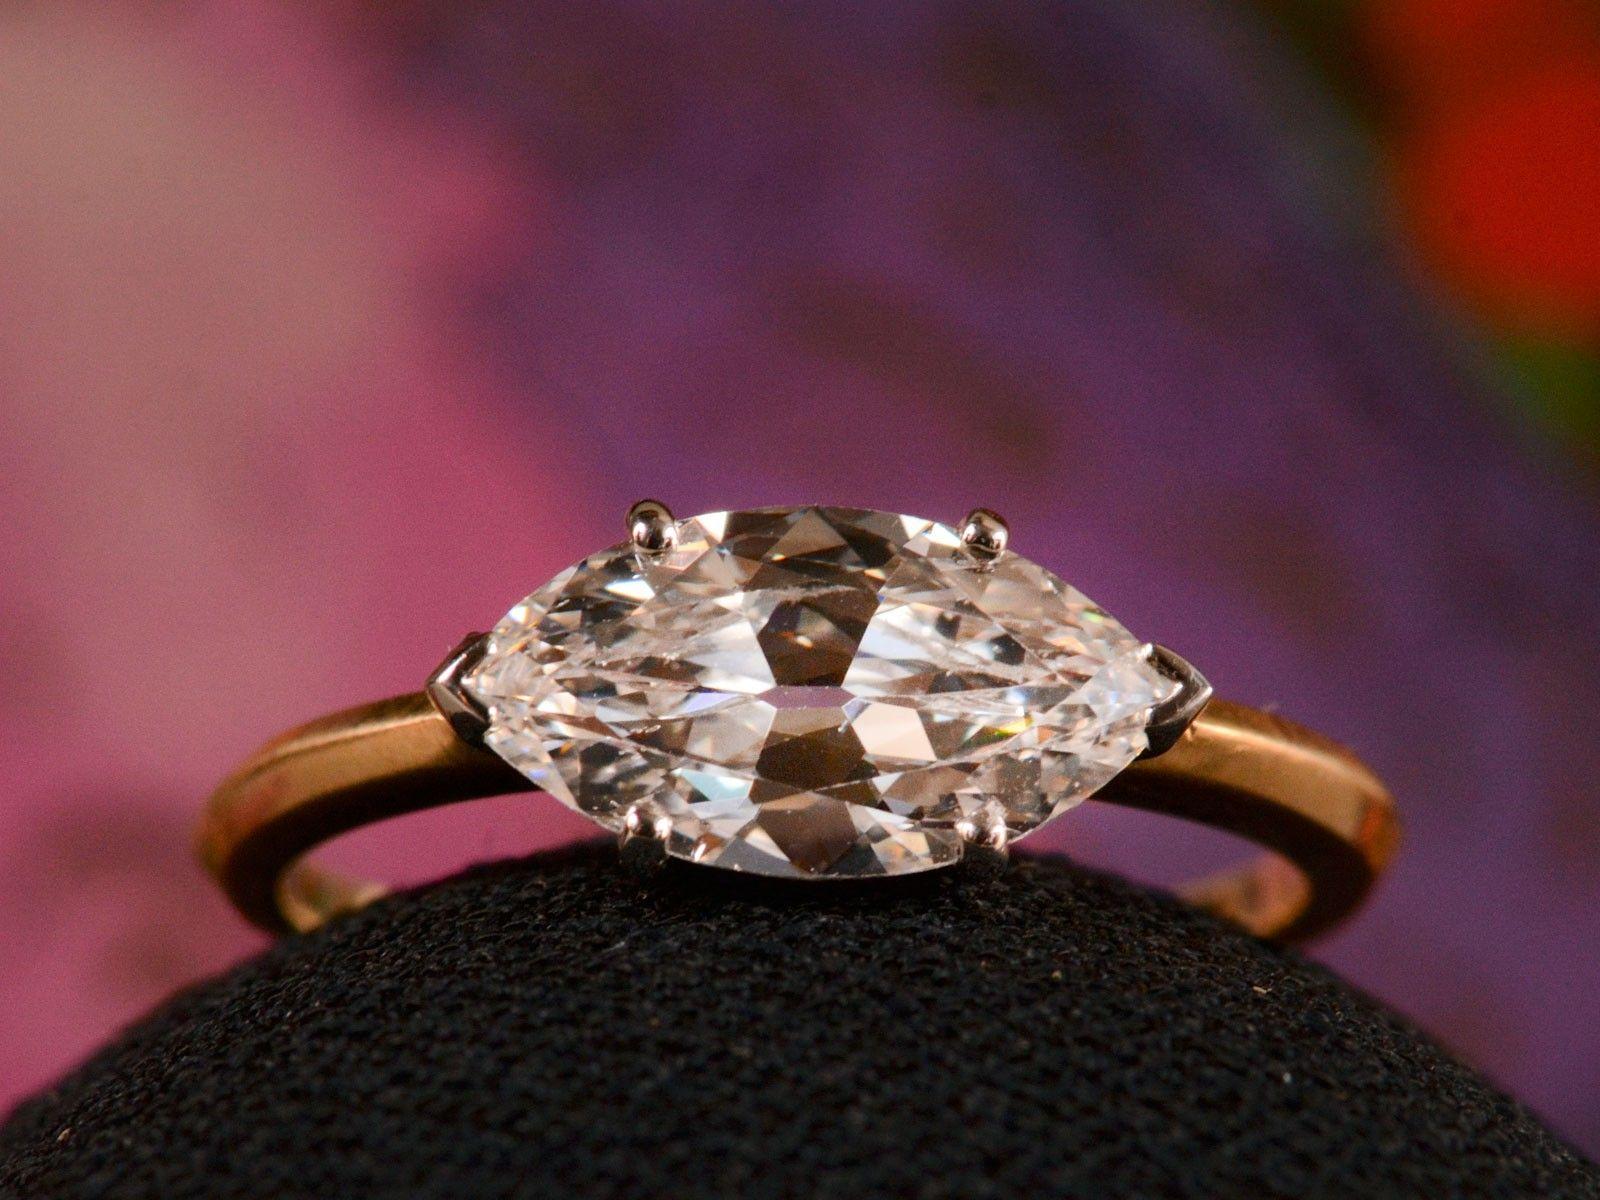 Marquise diamond setting ideas - Eb 1 51ct East West Marquise Diamond Ring